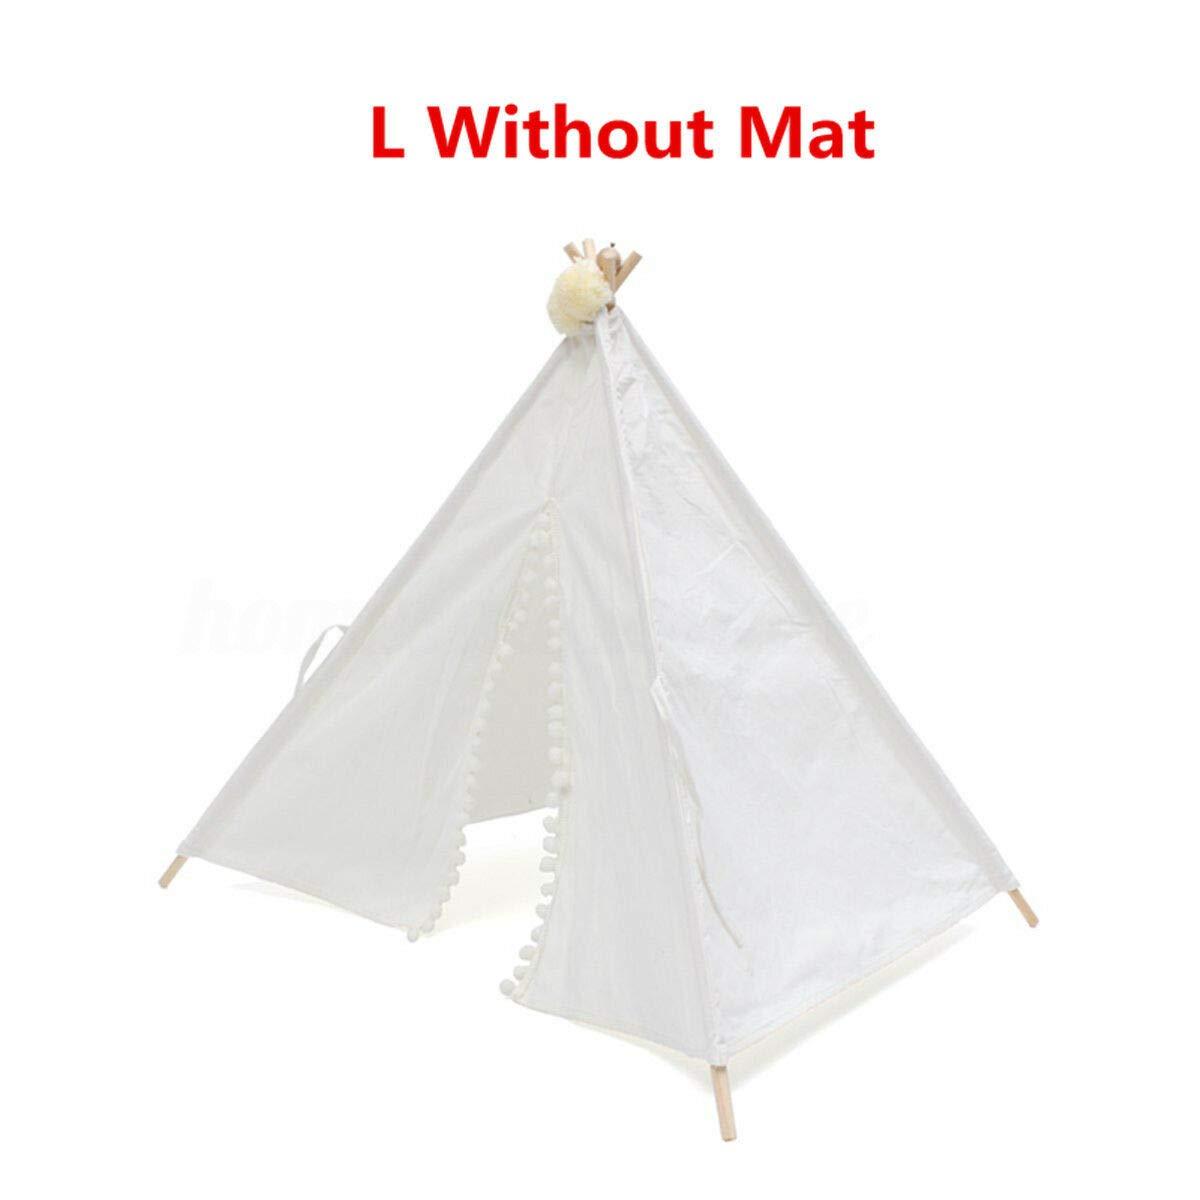 L Without Mat (707088Cm) FidgetGear Dog Cat Pet Teepee White Tent Portable Washable Sweet House Kids Play Tents S L L Without Mat (70  70  88Cm)